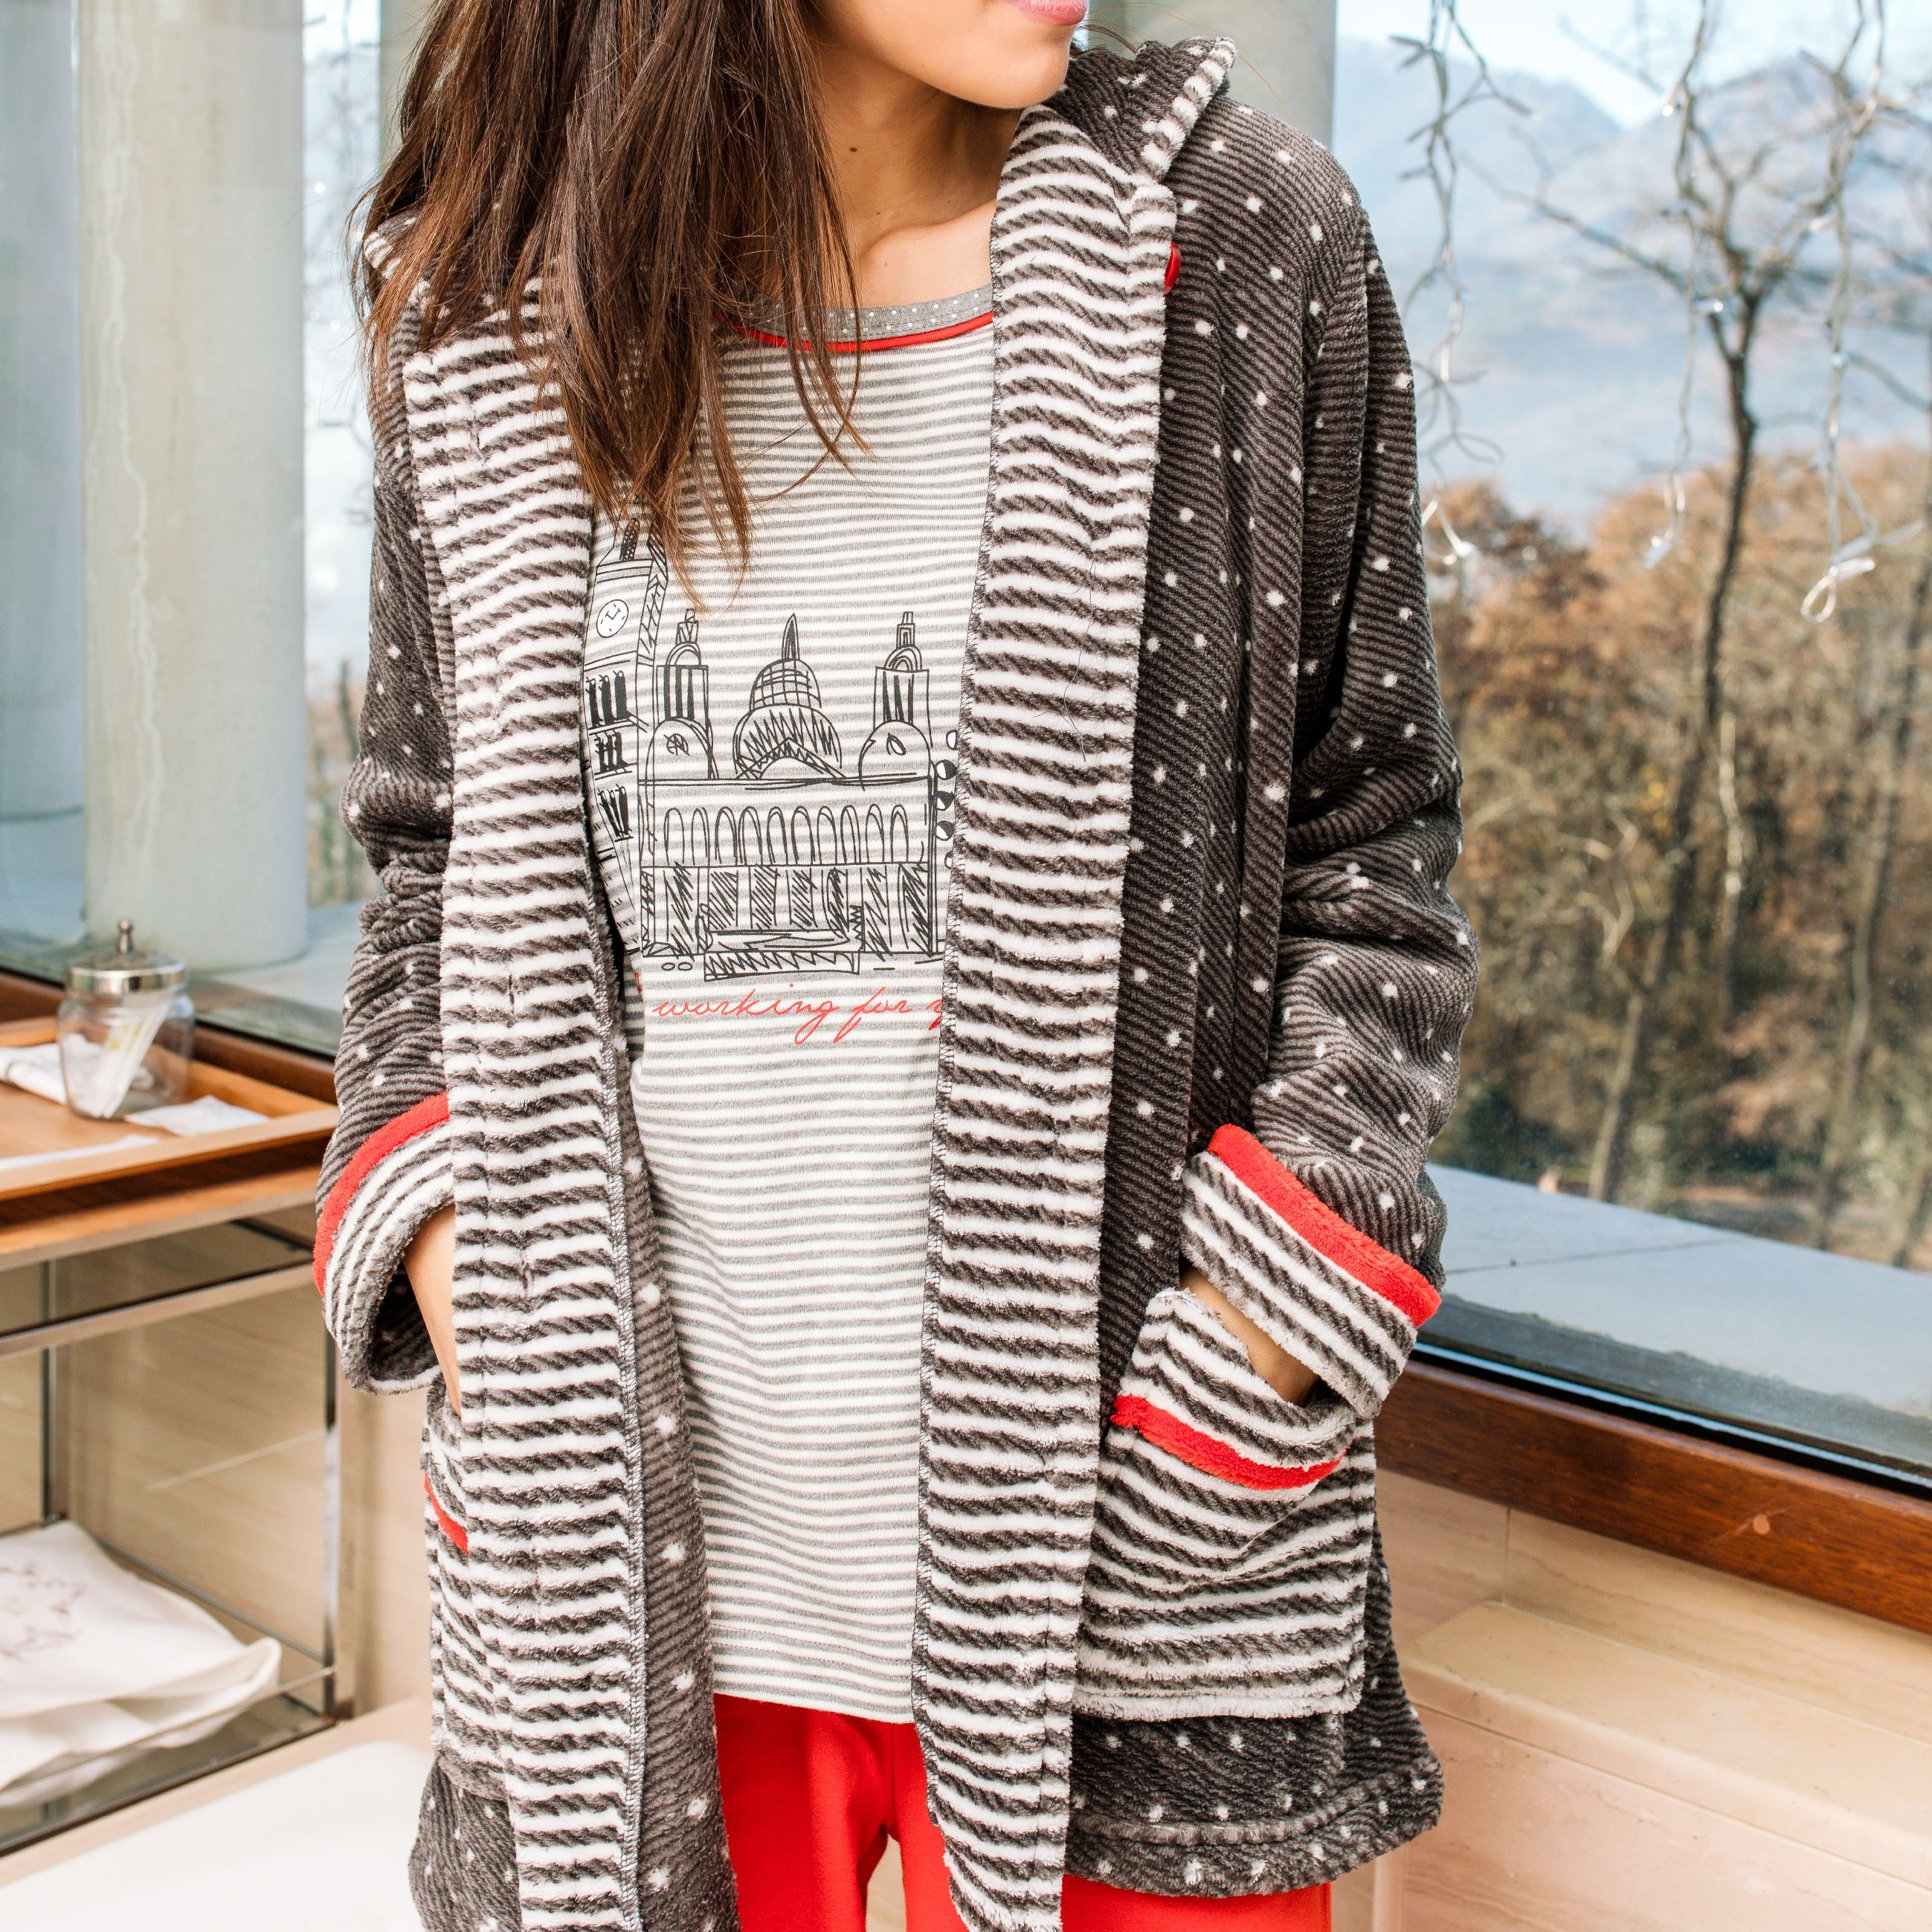 0649ef77d pijama bata señora pantalon camiseta largo leggings conejo rayas azul  marino rojo algodon robe pajama rabbit homewear sleepwear invierno winter  gris grey ...